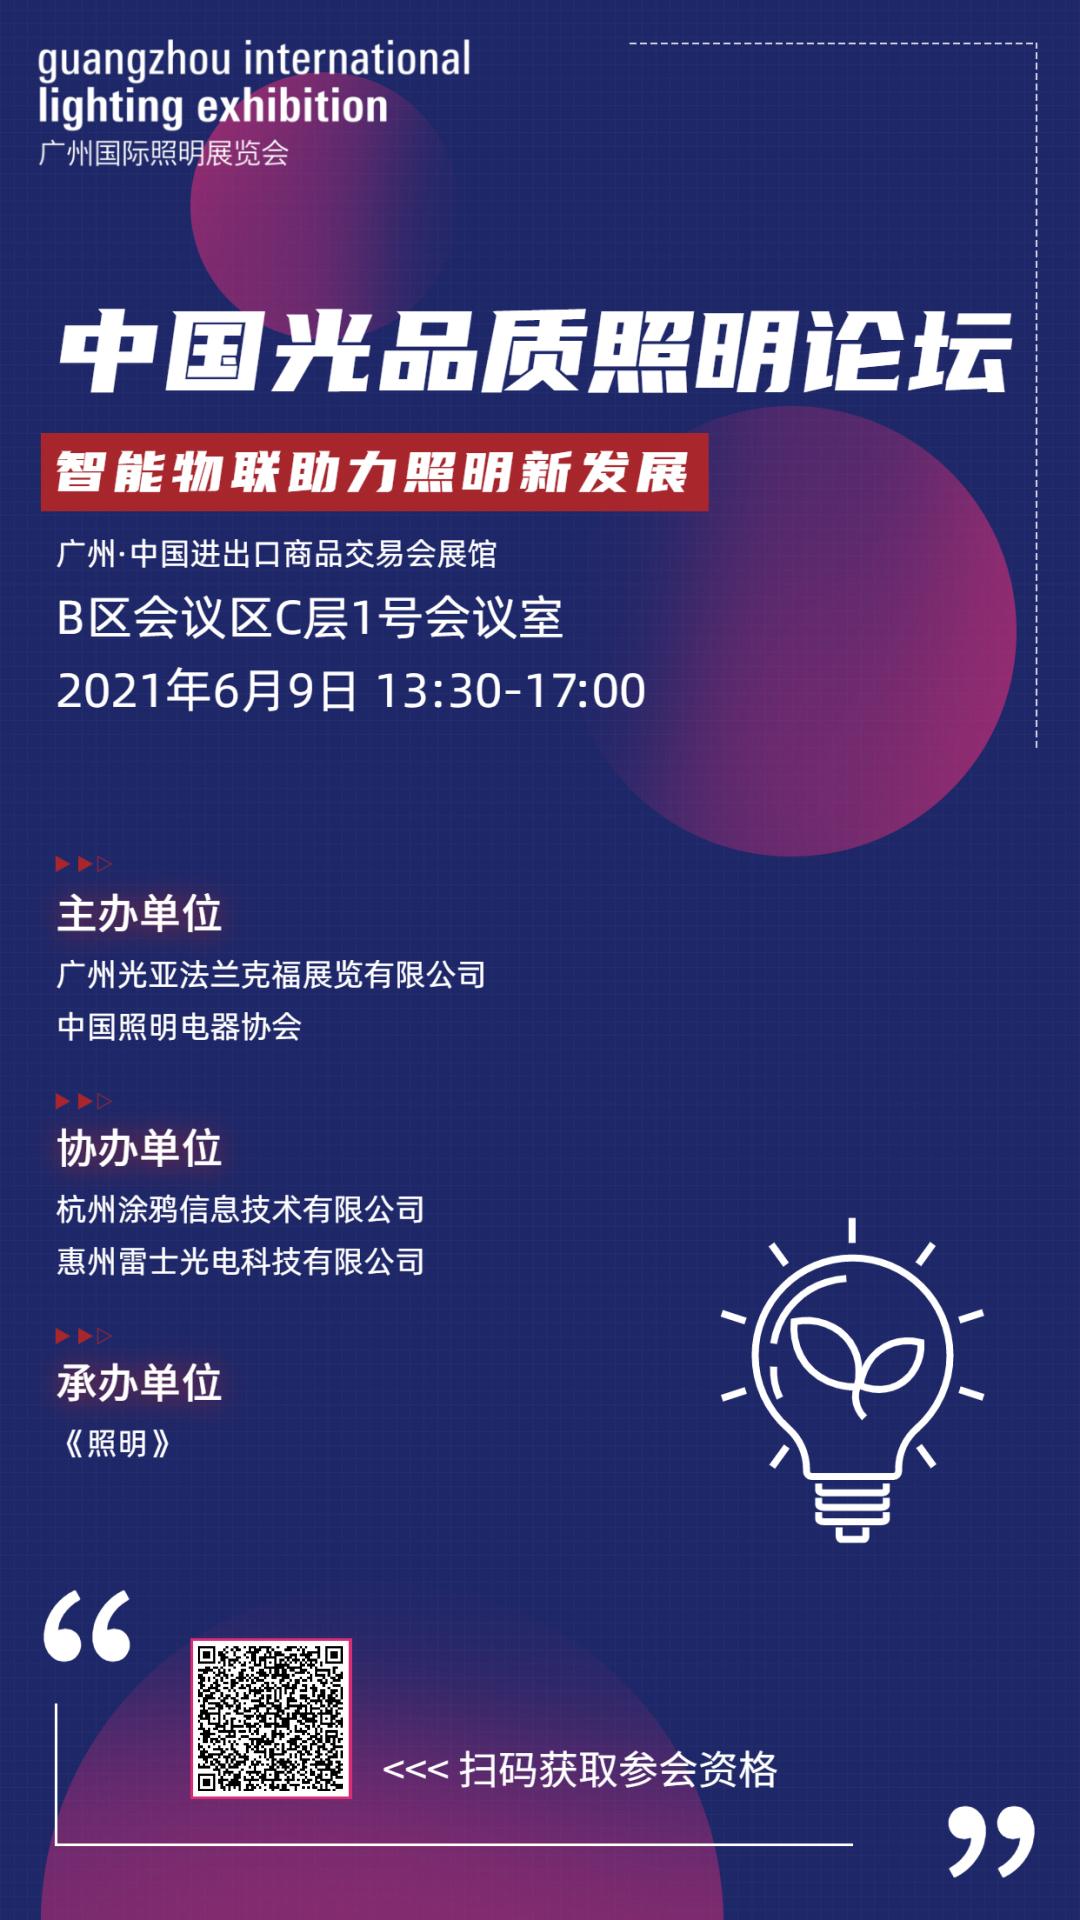 【GILE2021论坛】中国光品质照明论坛,6月9日B区1号会议室,助力照明新发展!